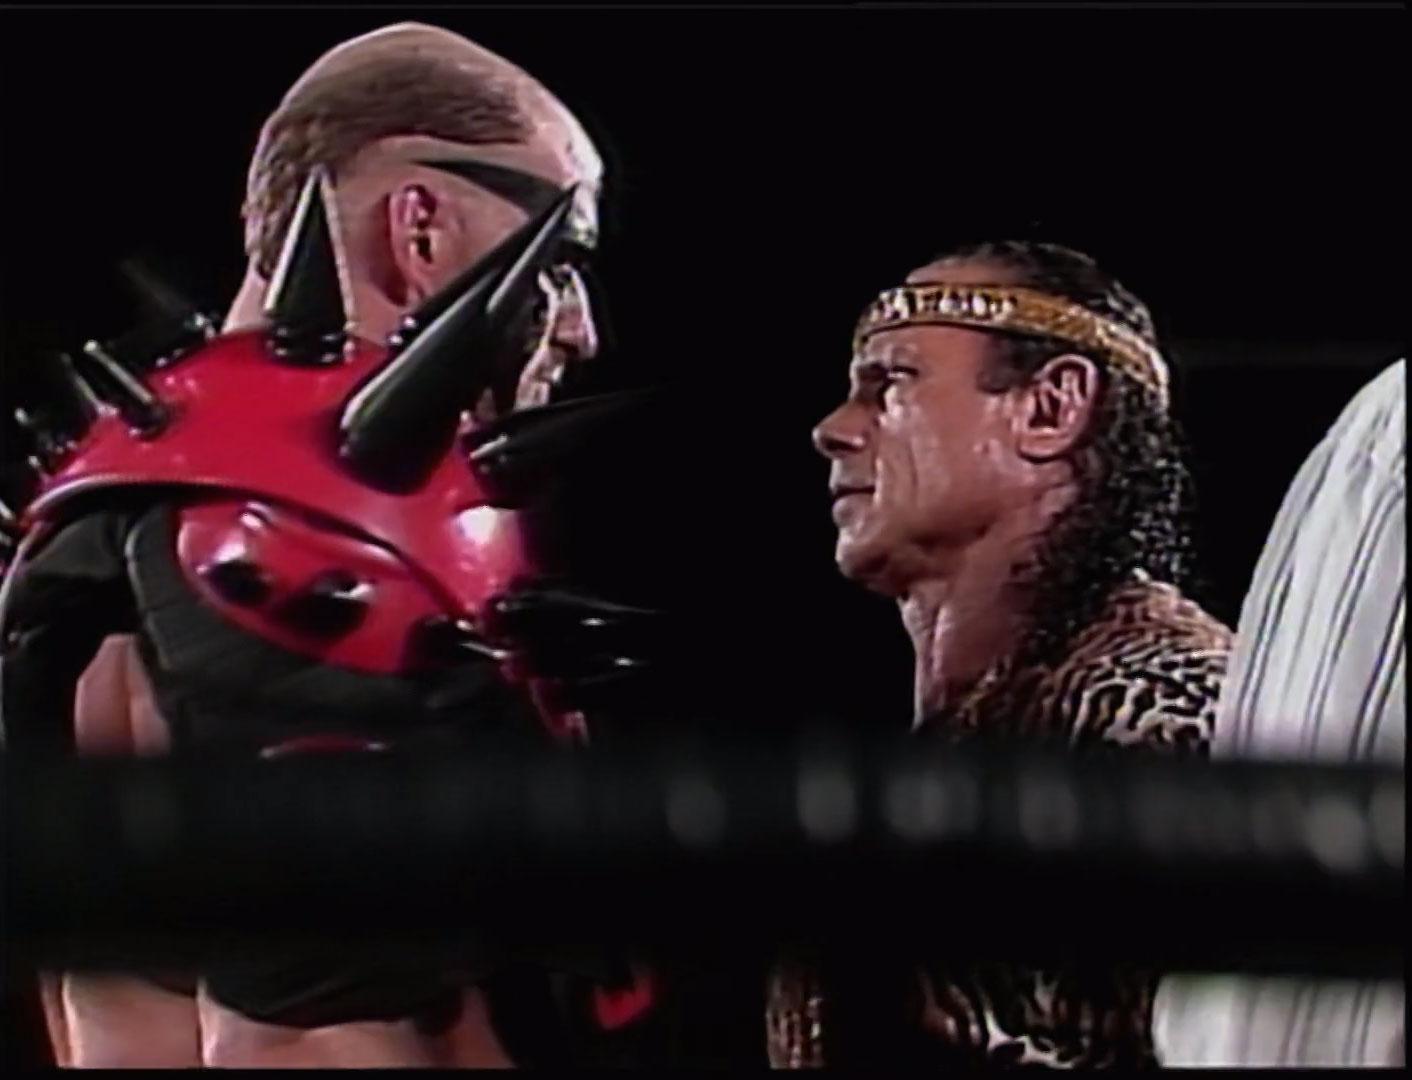 Jimmy Snuka vs. Road Warrior Hawk ECW Television Championship ECW Hardcore TV, June 15th 1993